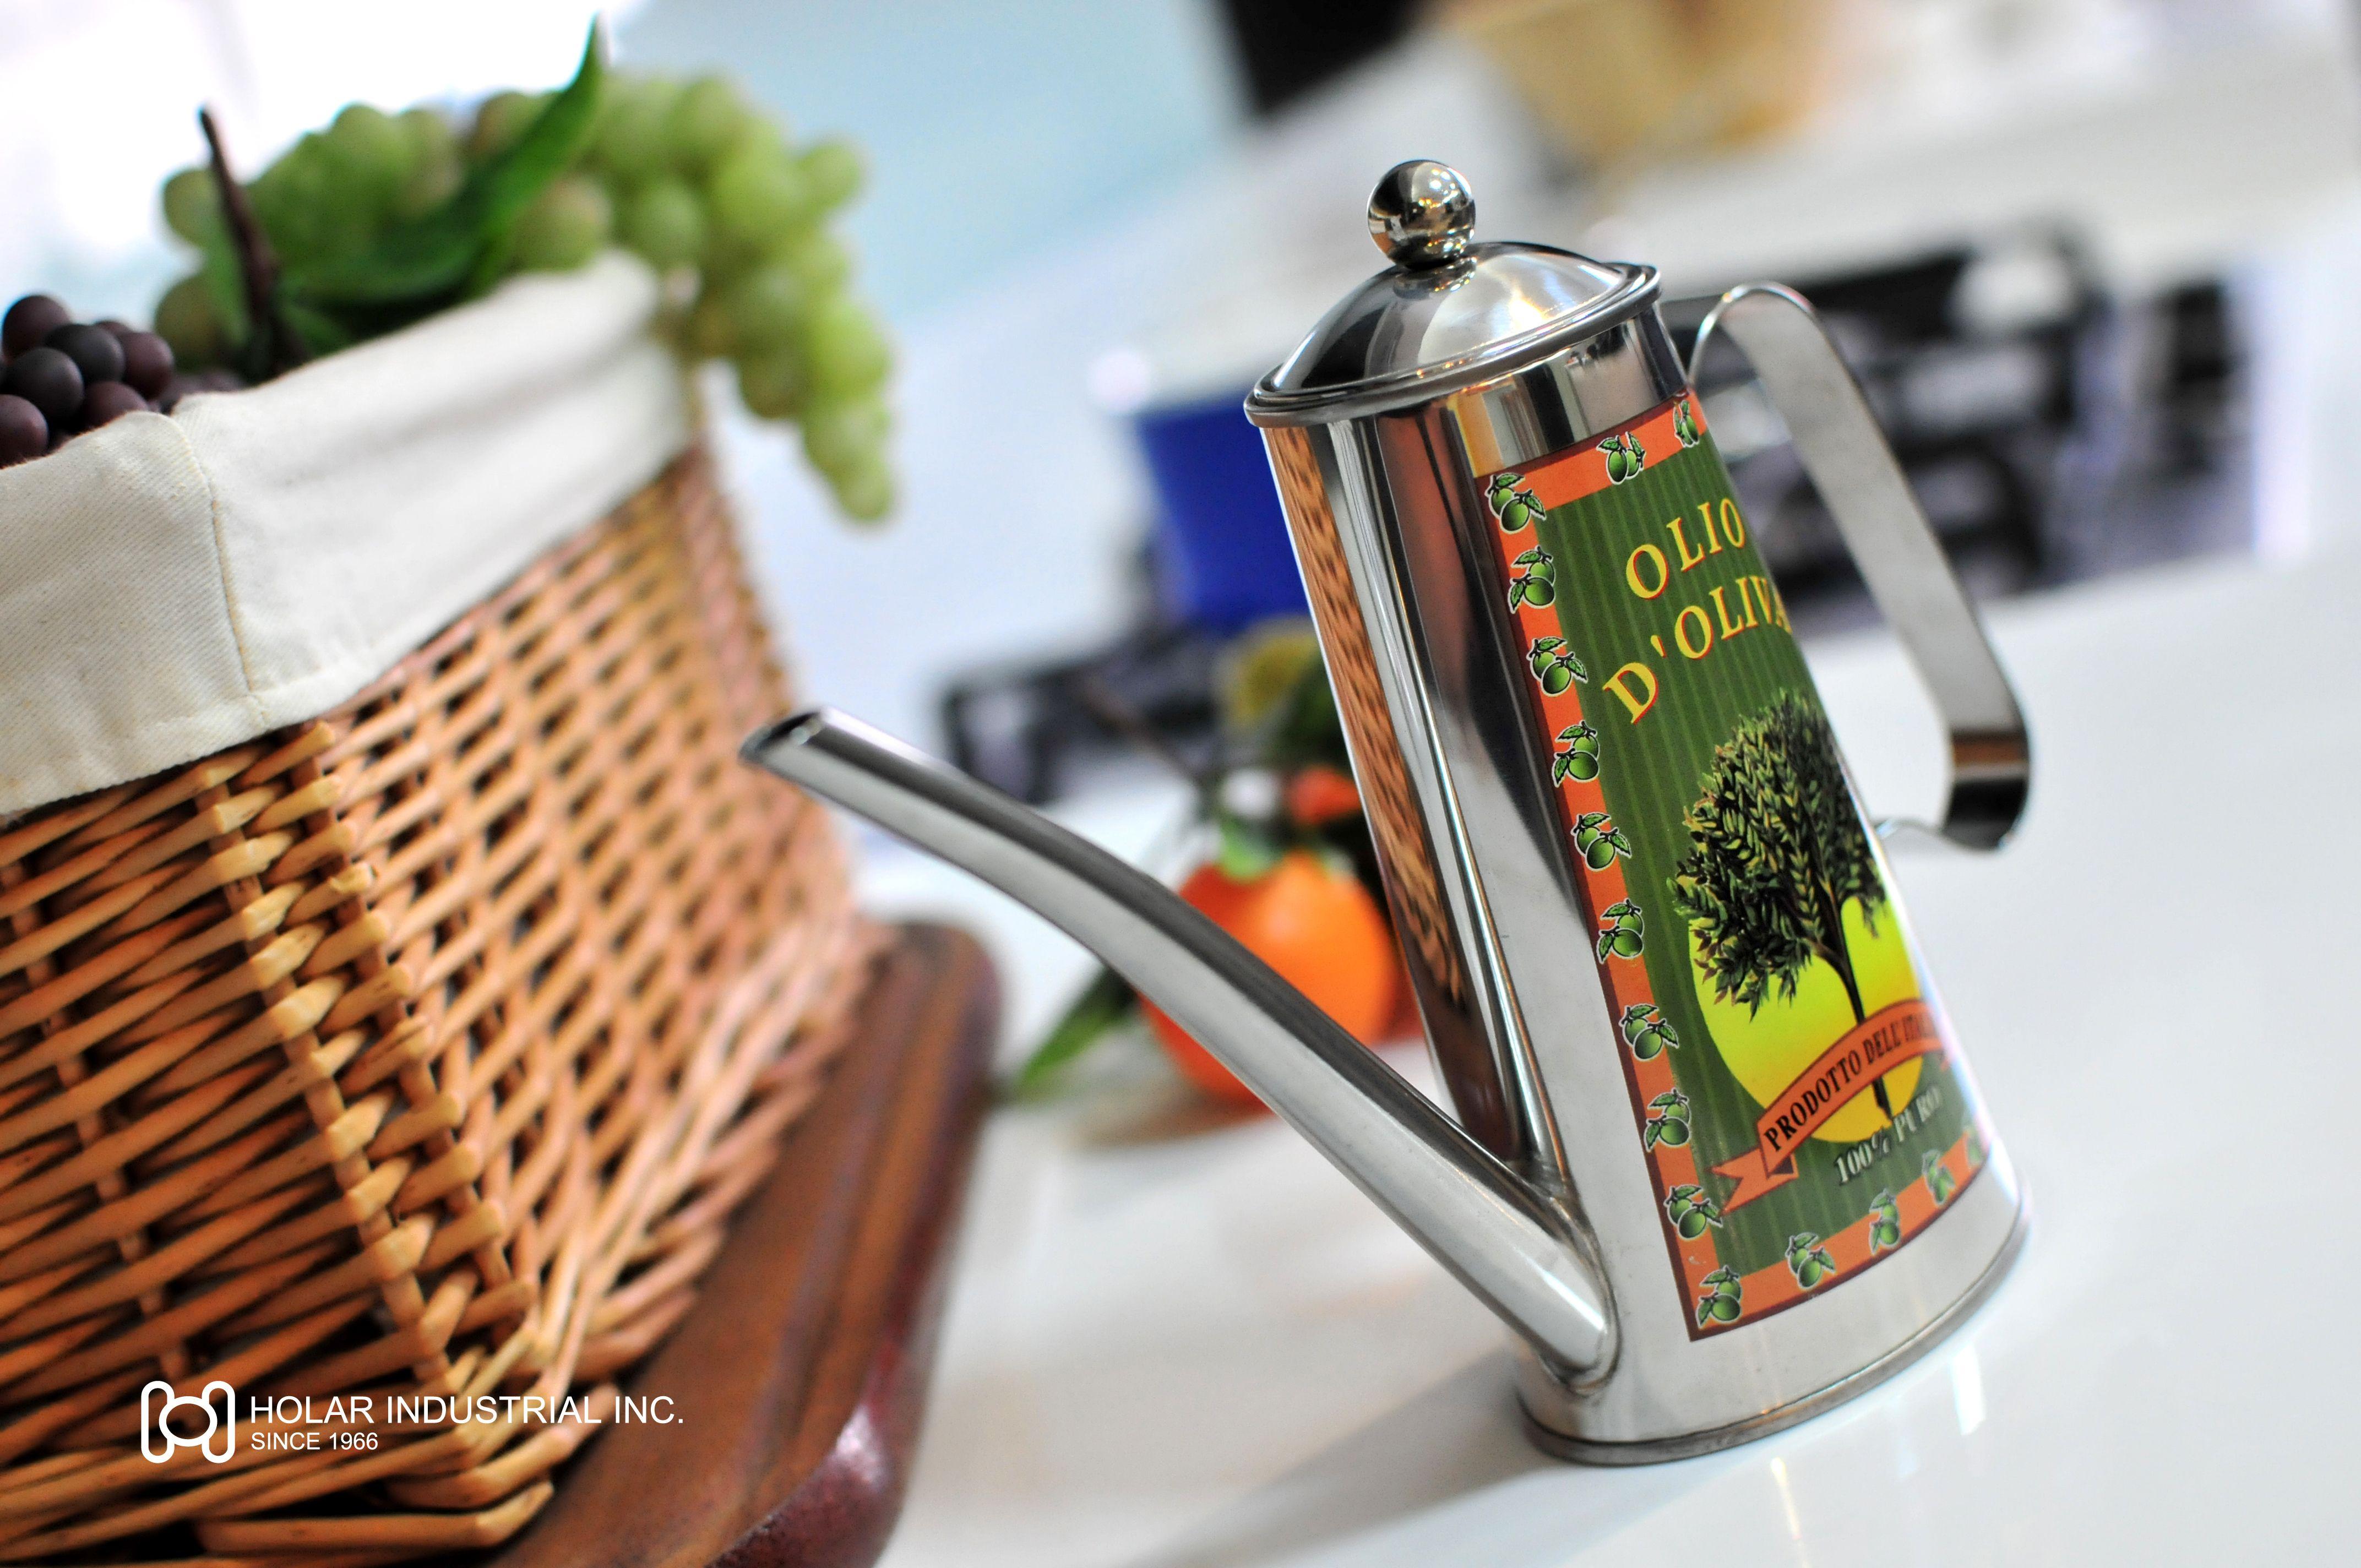 holar oil can in a kitchen kitchen oil storage ideas oil and vinegar dispensers oil storage on kitchen organization oil and vinegar id=66976